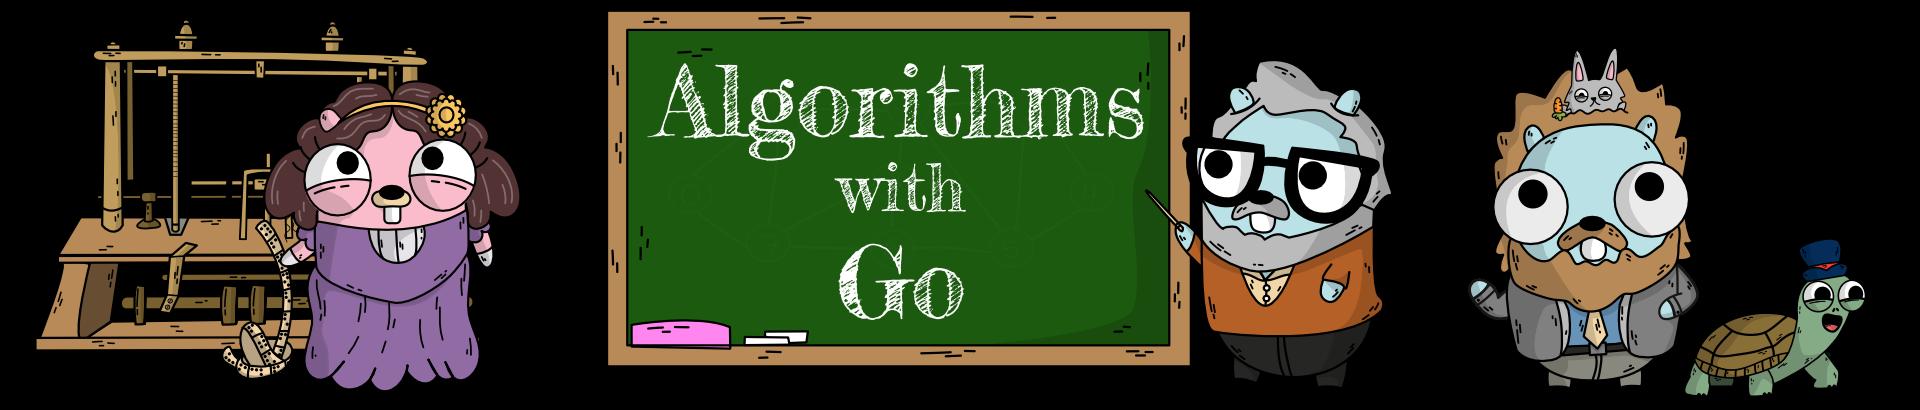 Algorithms with Go Artwork